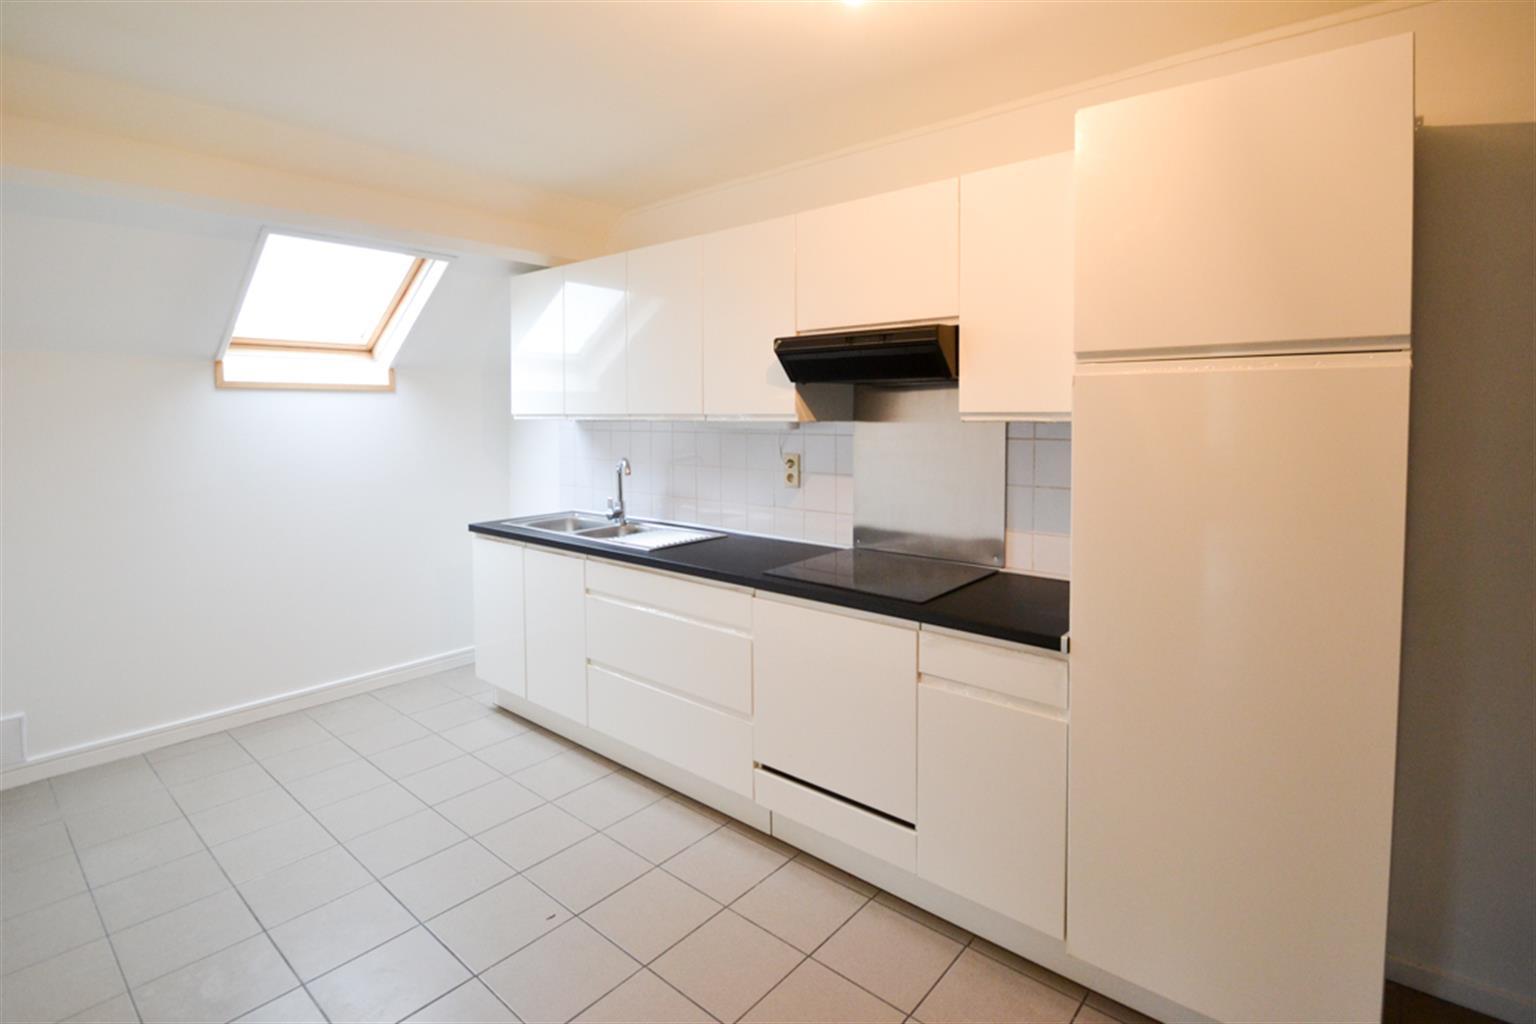 Appartement - Leval-Trahegnies - #3703788-1